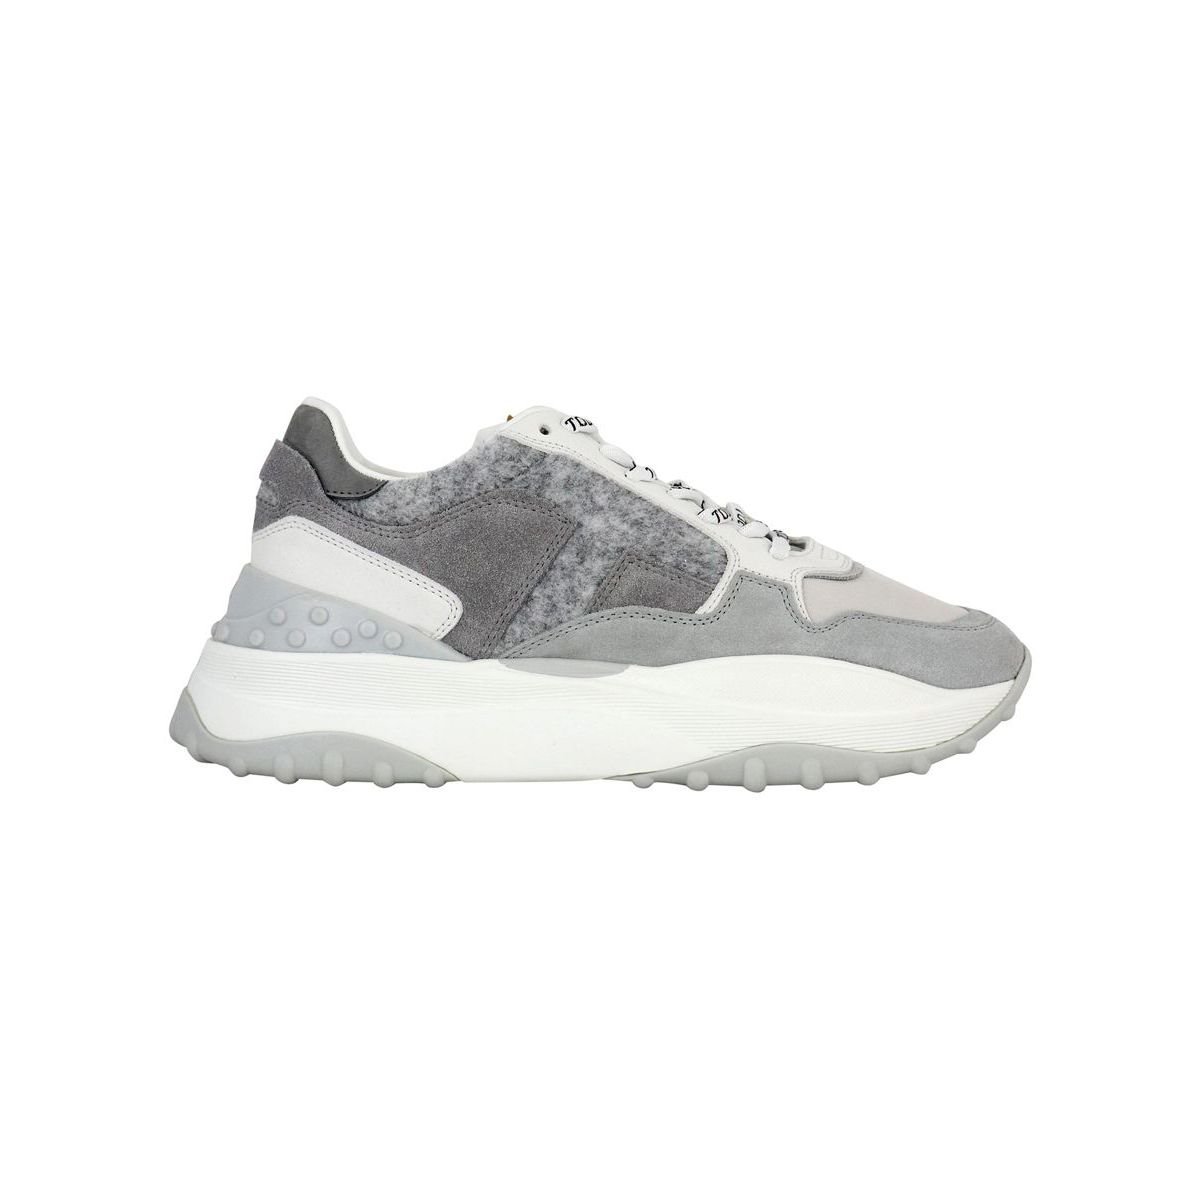 45B sports bottom sneakers White / gray Tod's